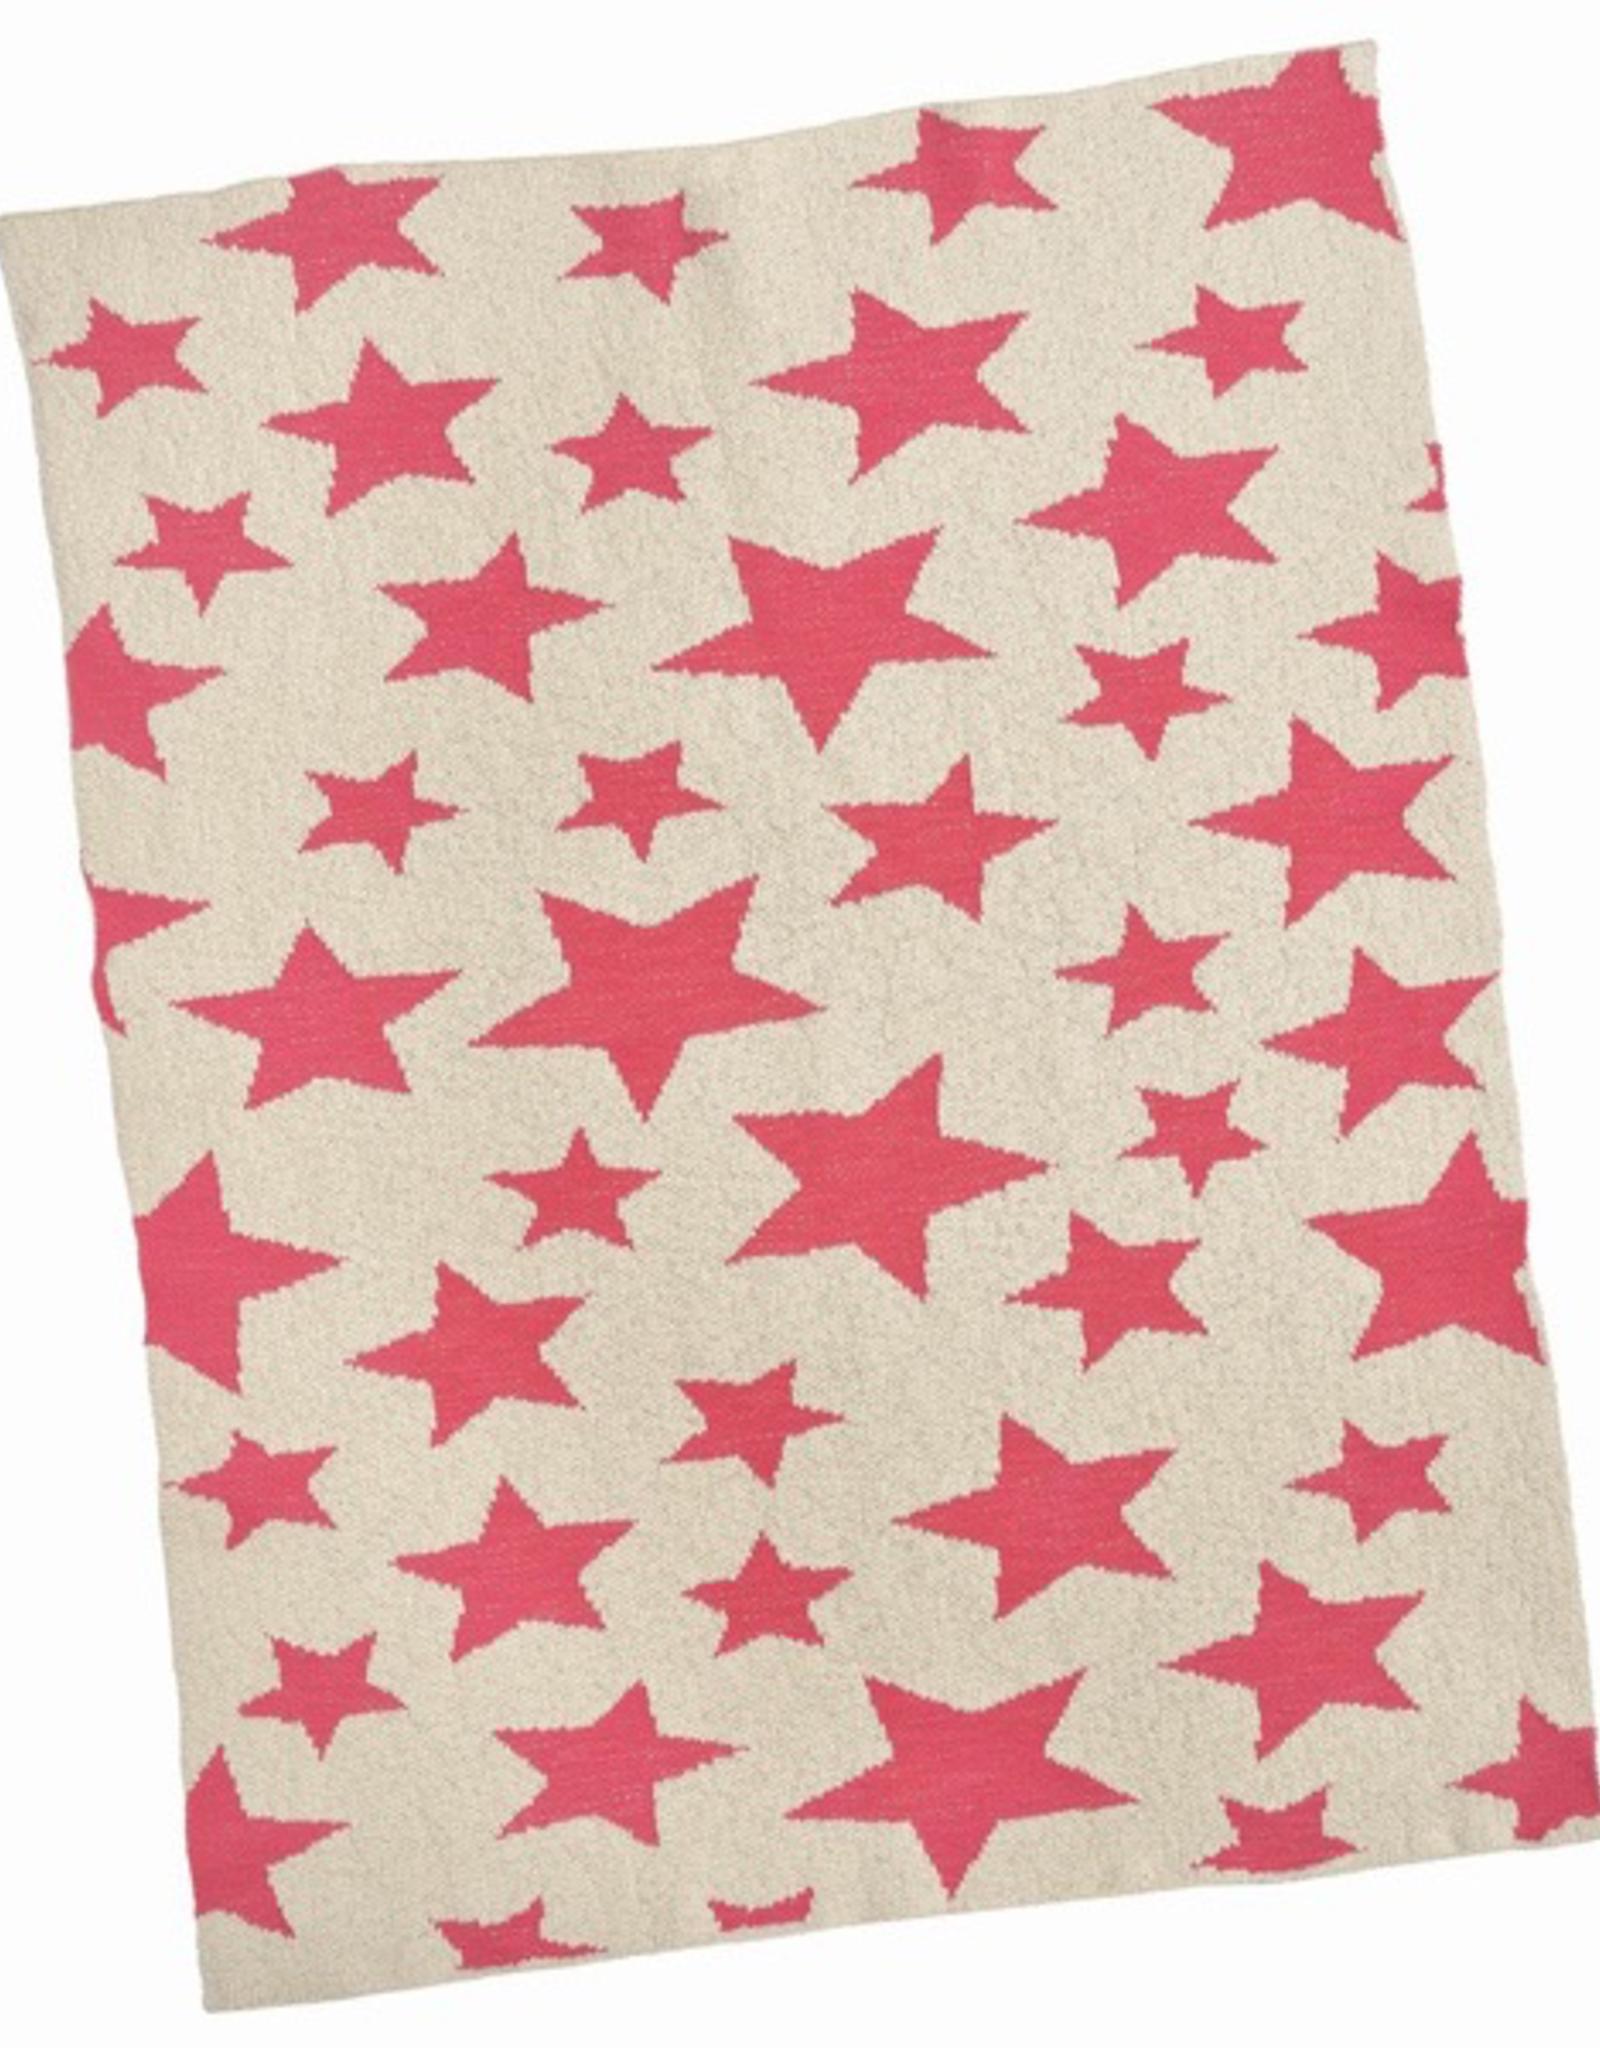 Blanket, baby, Pink Multi Star, Cotton